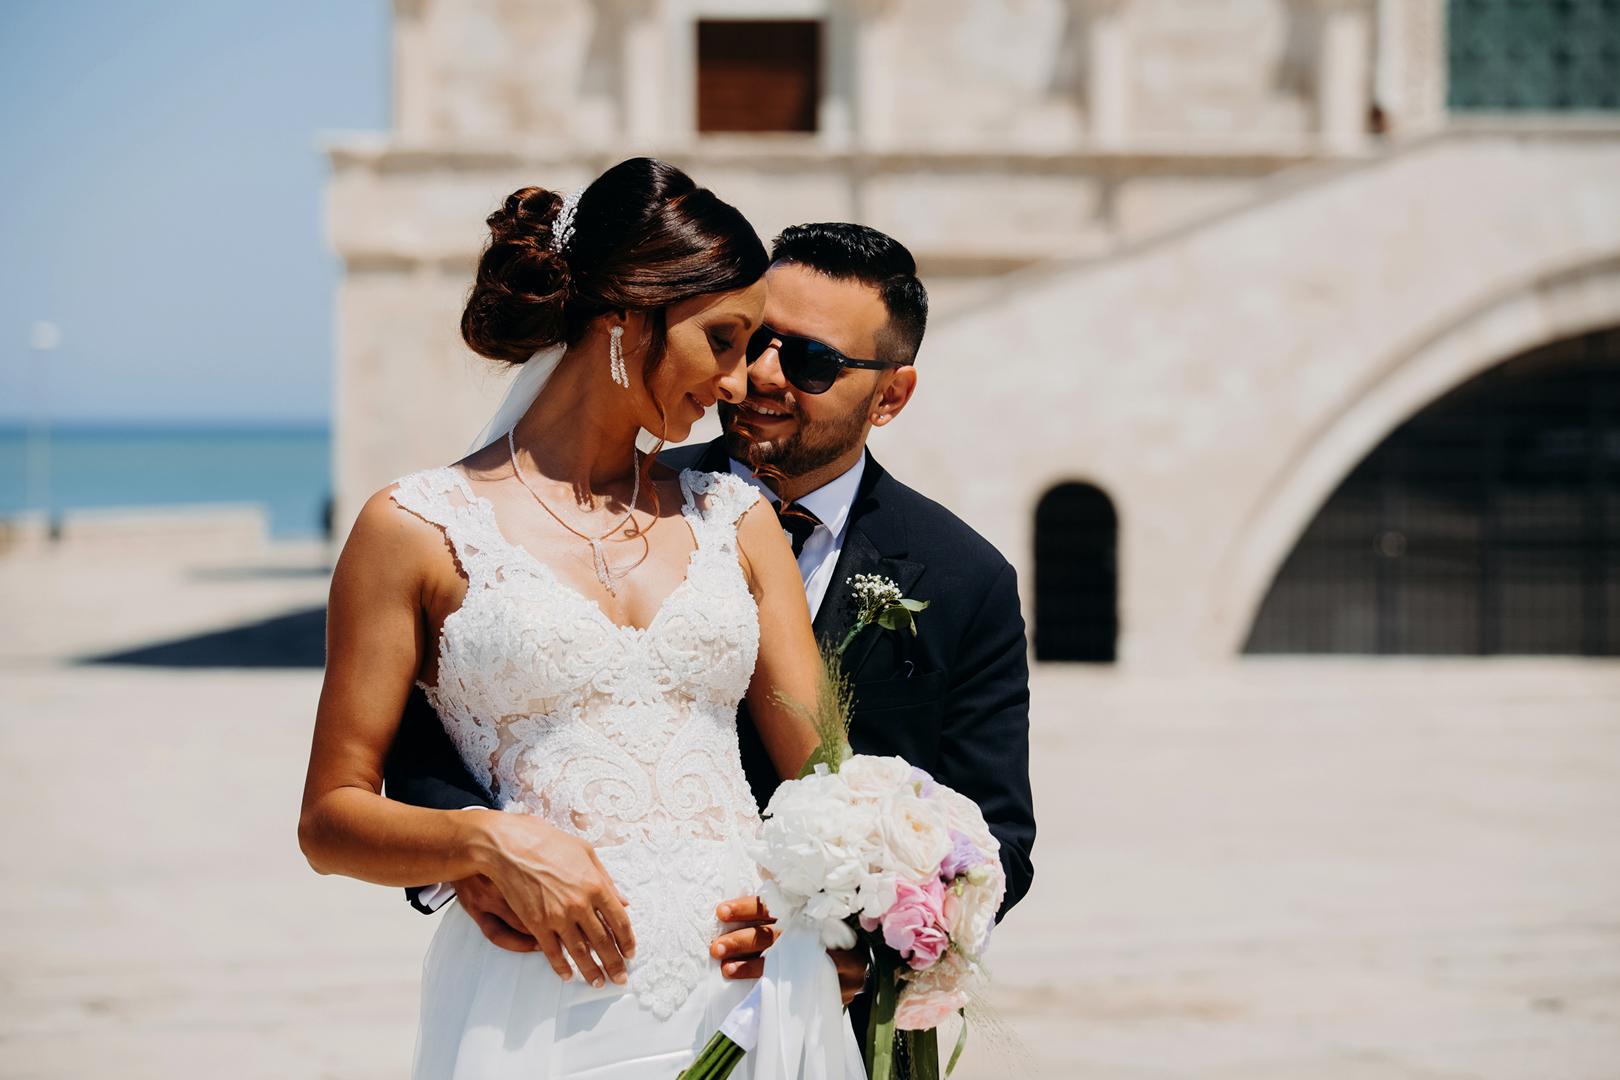 17. gianni-lepore-fotografo-matrimonio-trani-sposi-groom-bride